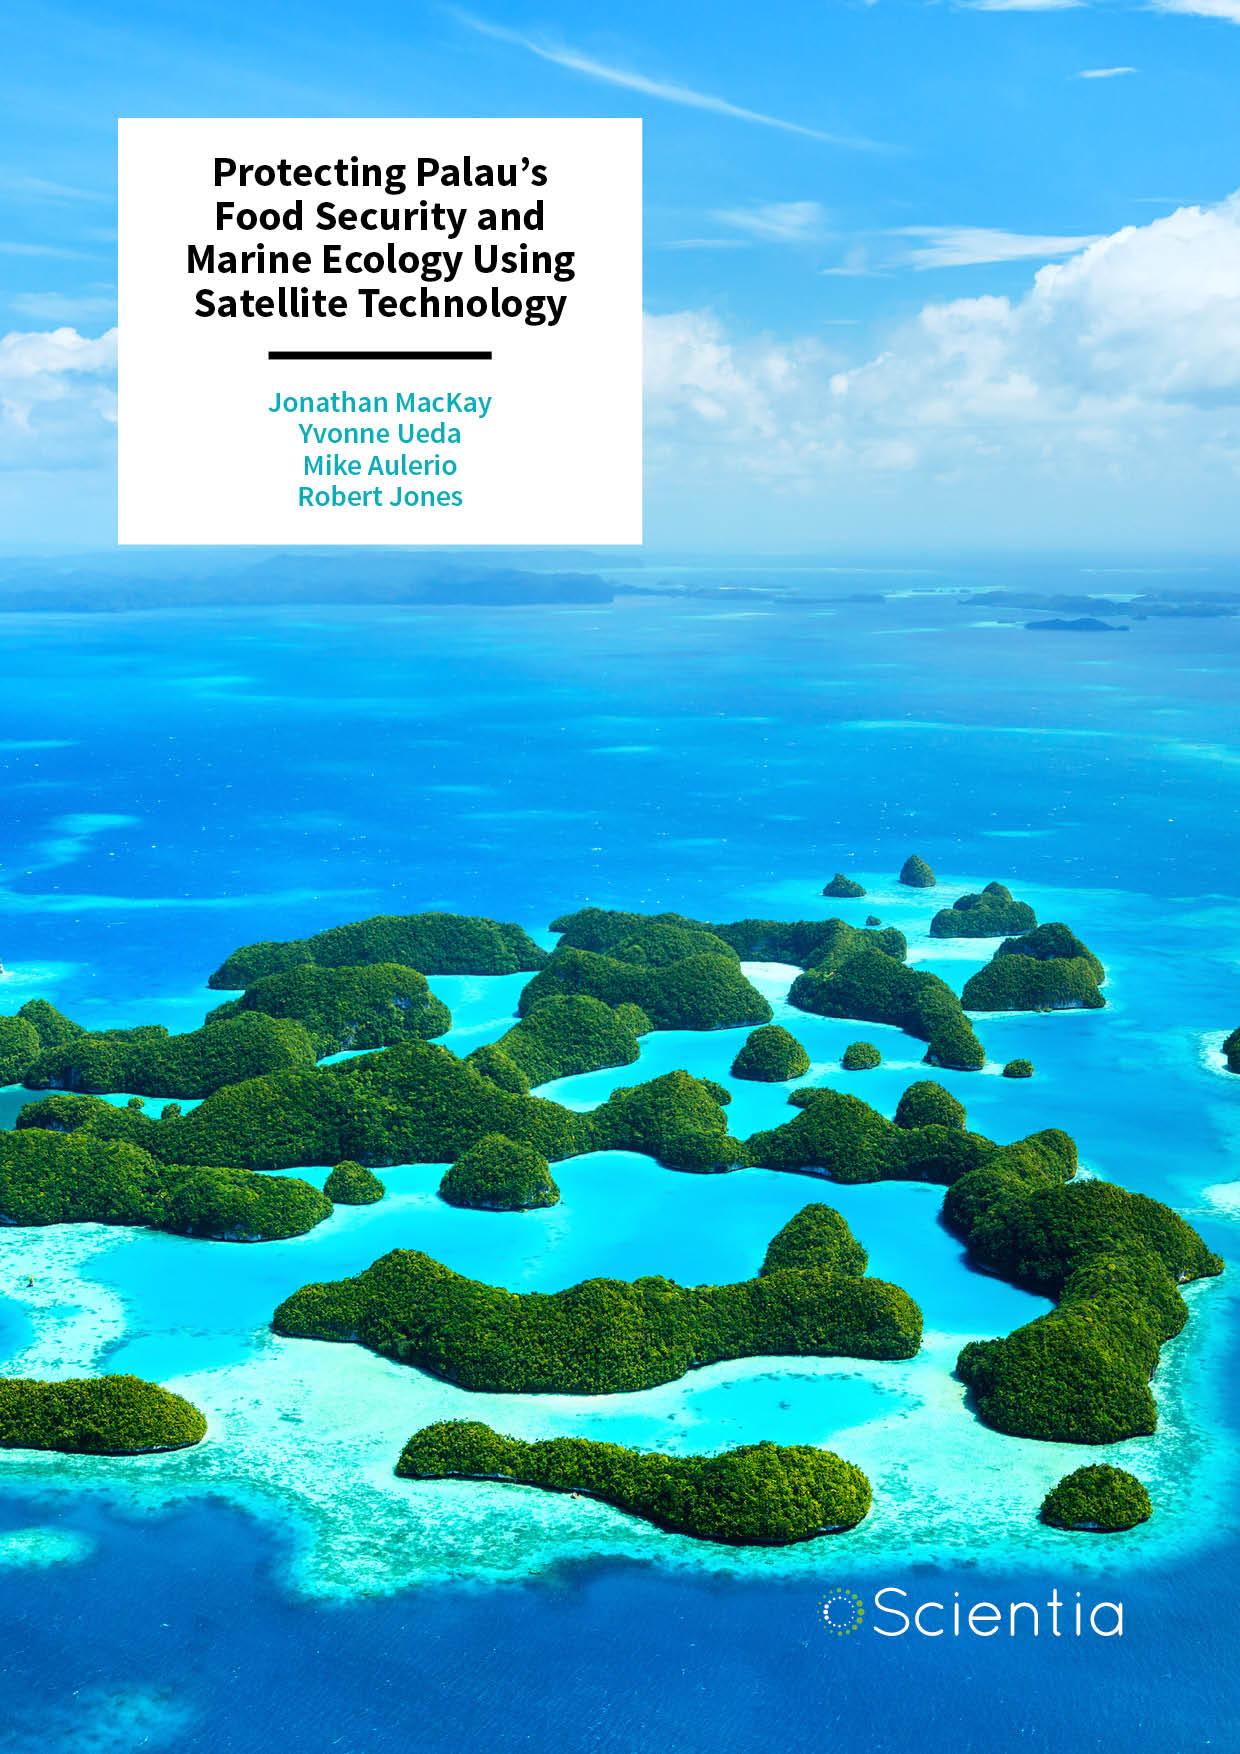 Protecting Palau's Food Security and Marine Ecology Using Satellite Technology